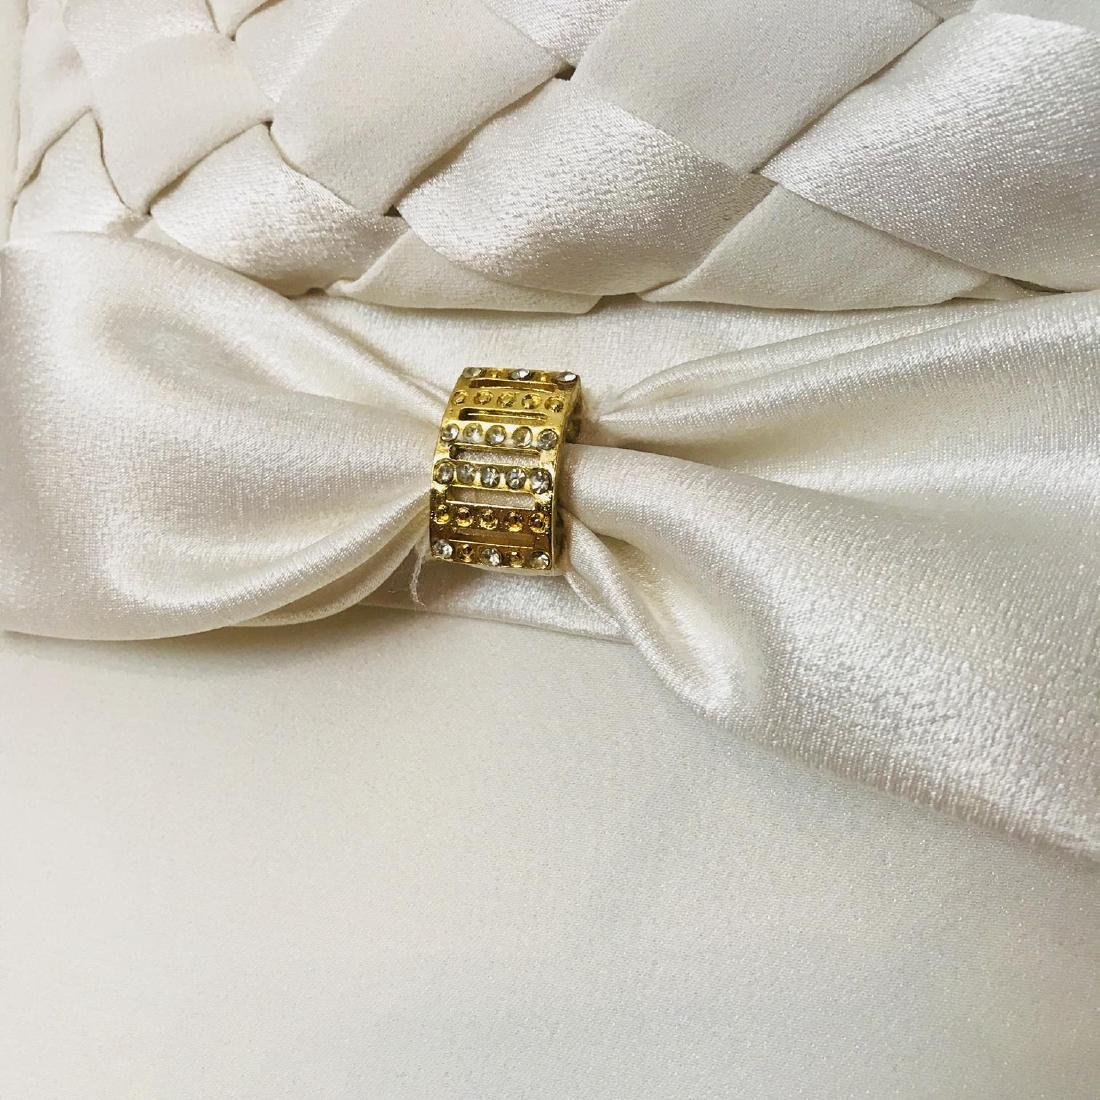 Vintage Women's White Designer Dress Size US 8 EUR 38 - 5